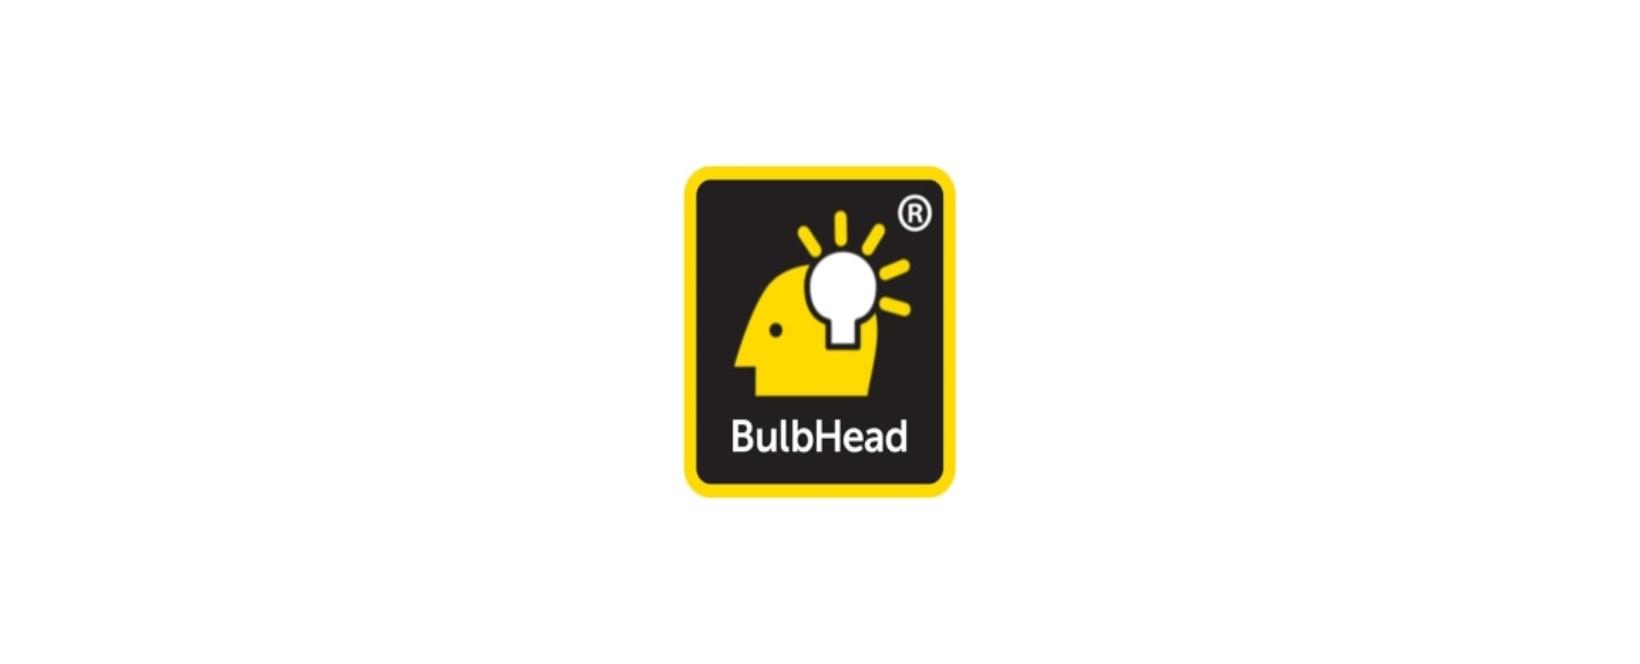 BulbHead Discount Code 2021